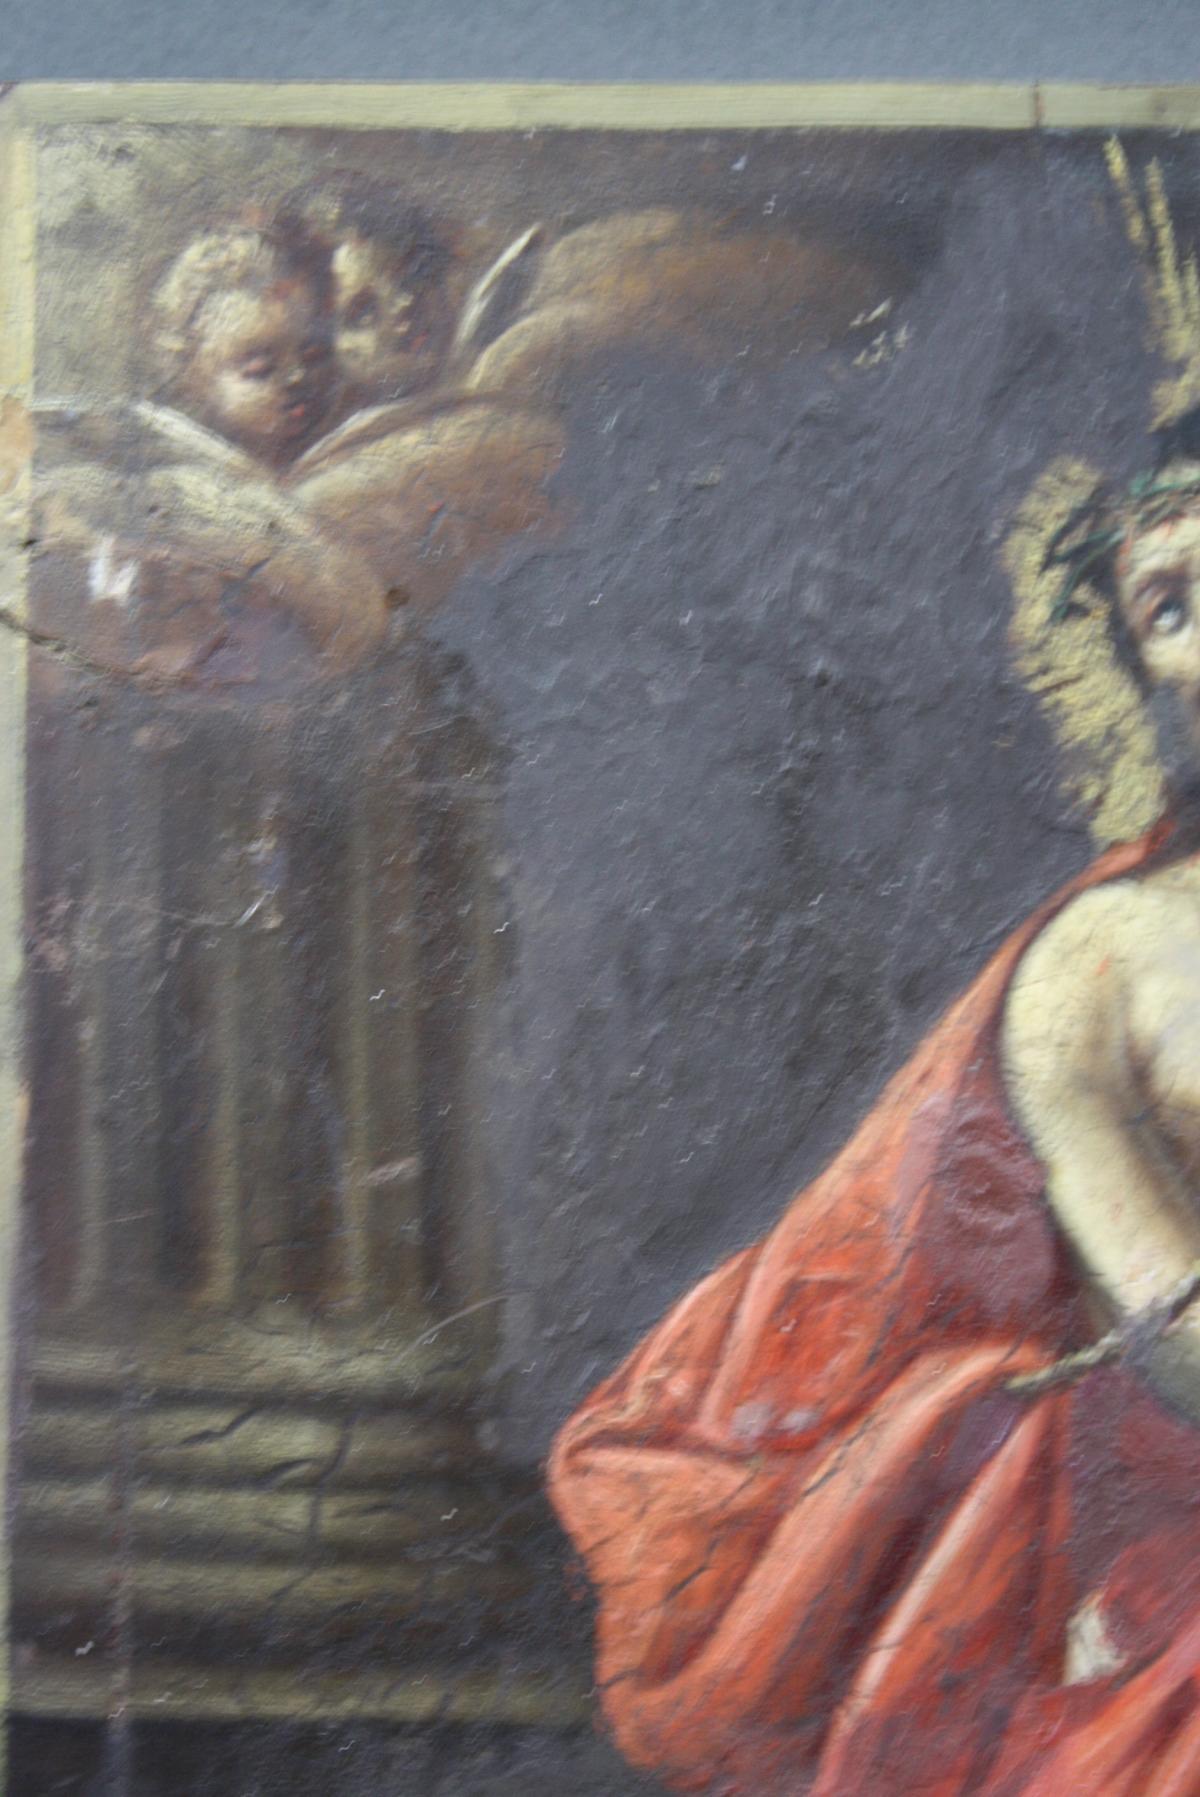 Ikone, Hl. Johannes der Täufer-3